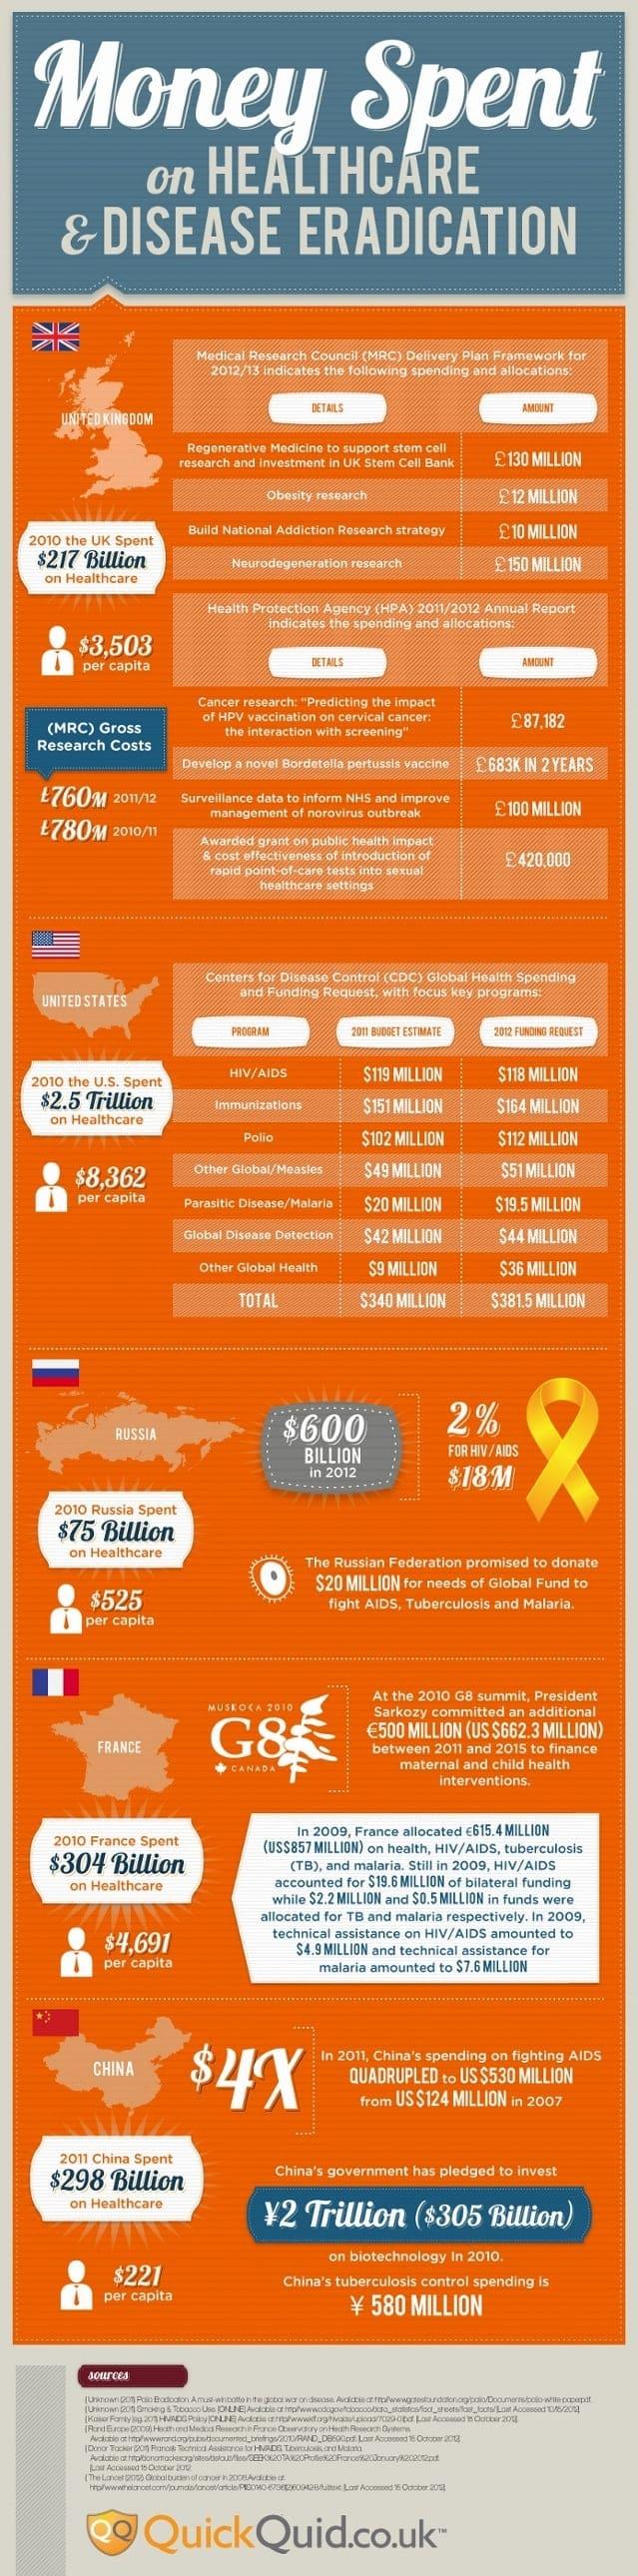 Money Spent on Healthcare and Disease Eradication